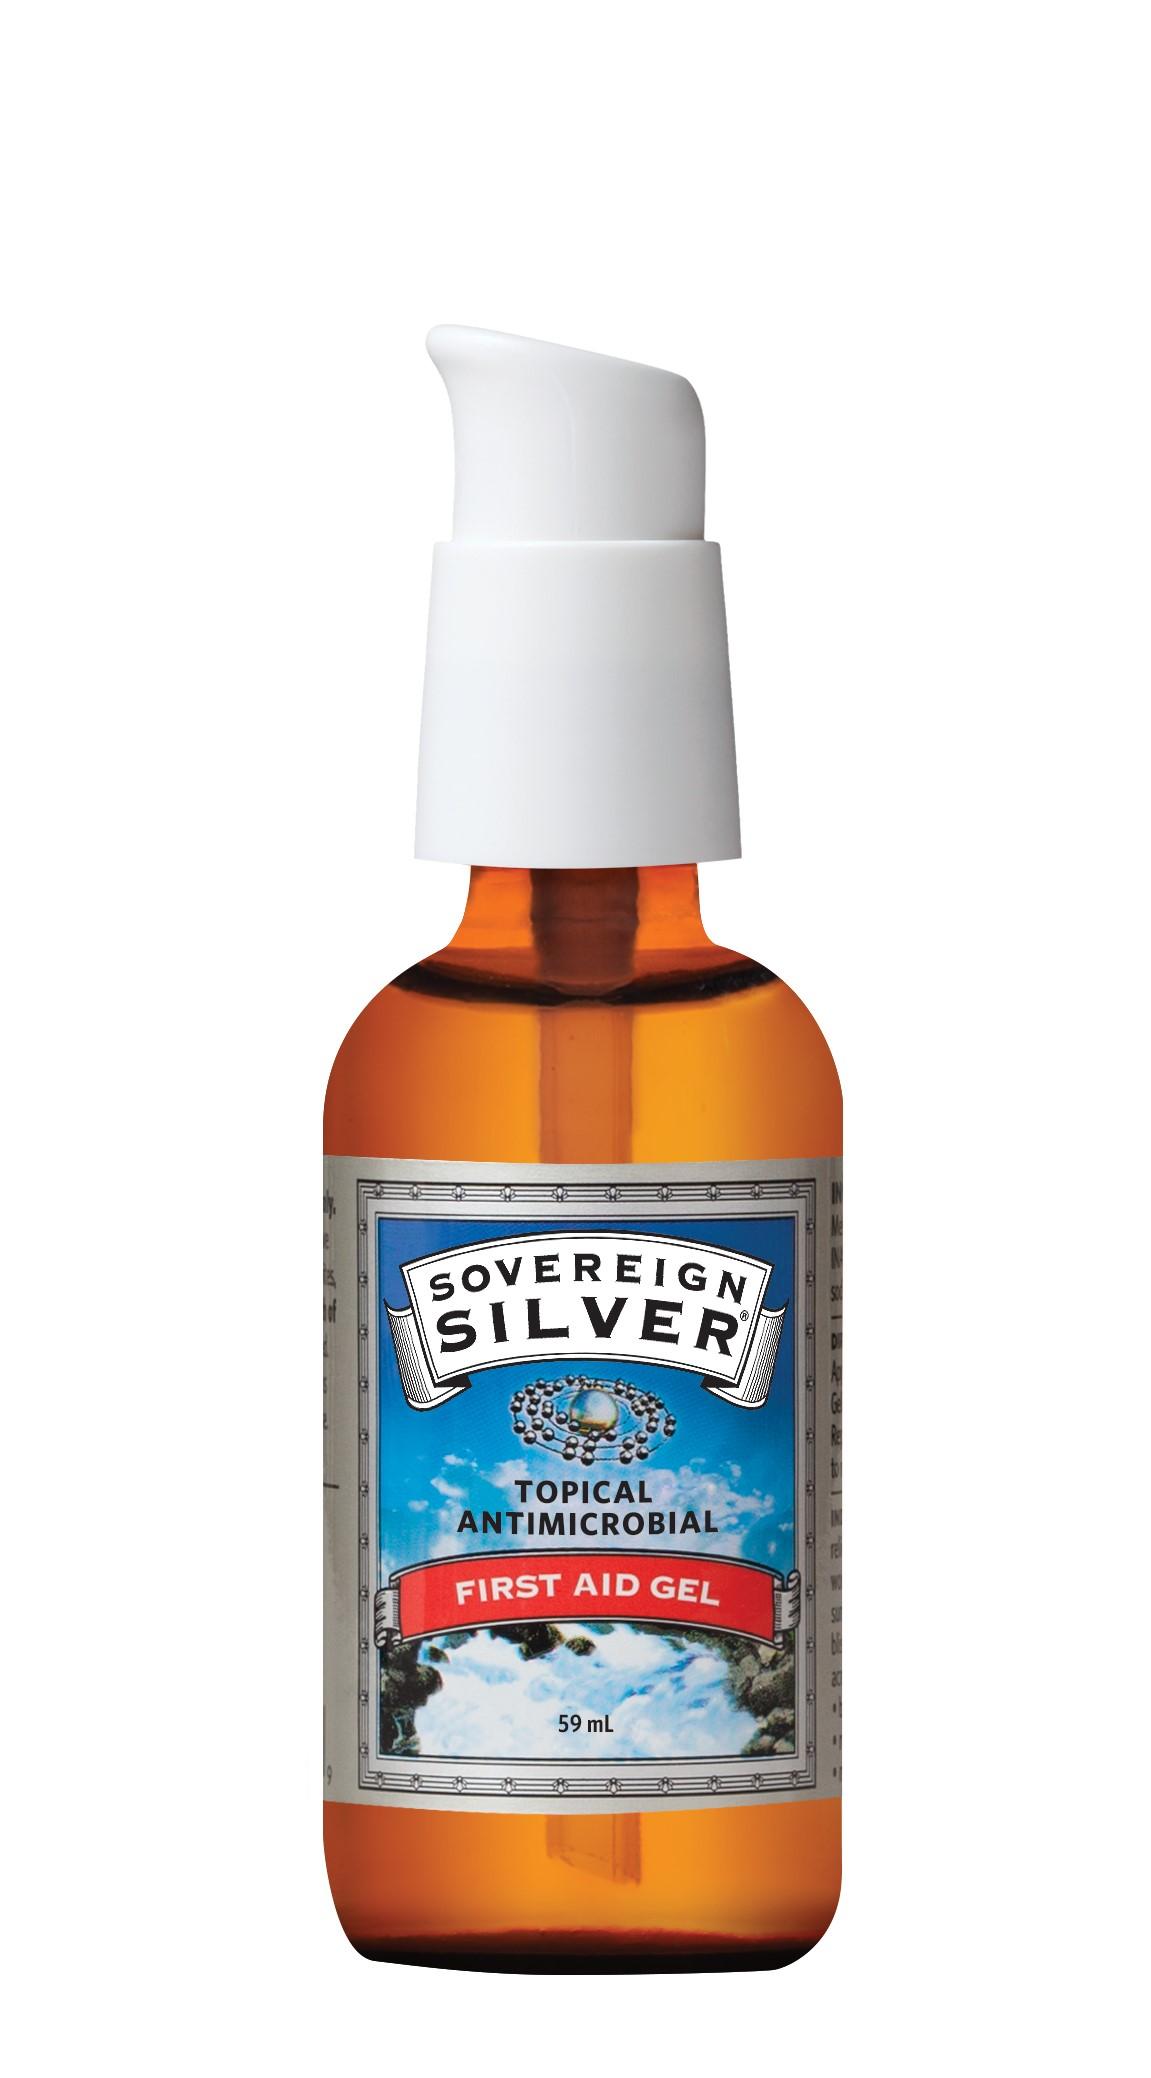 Sovereign Silver First Aid Gel 59ml